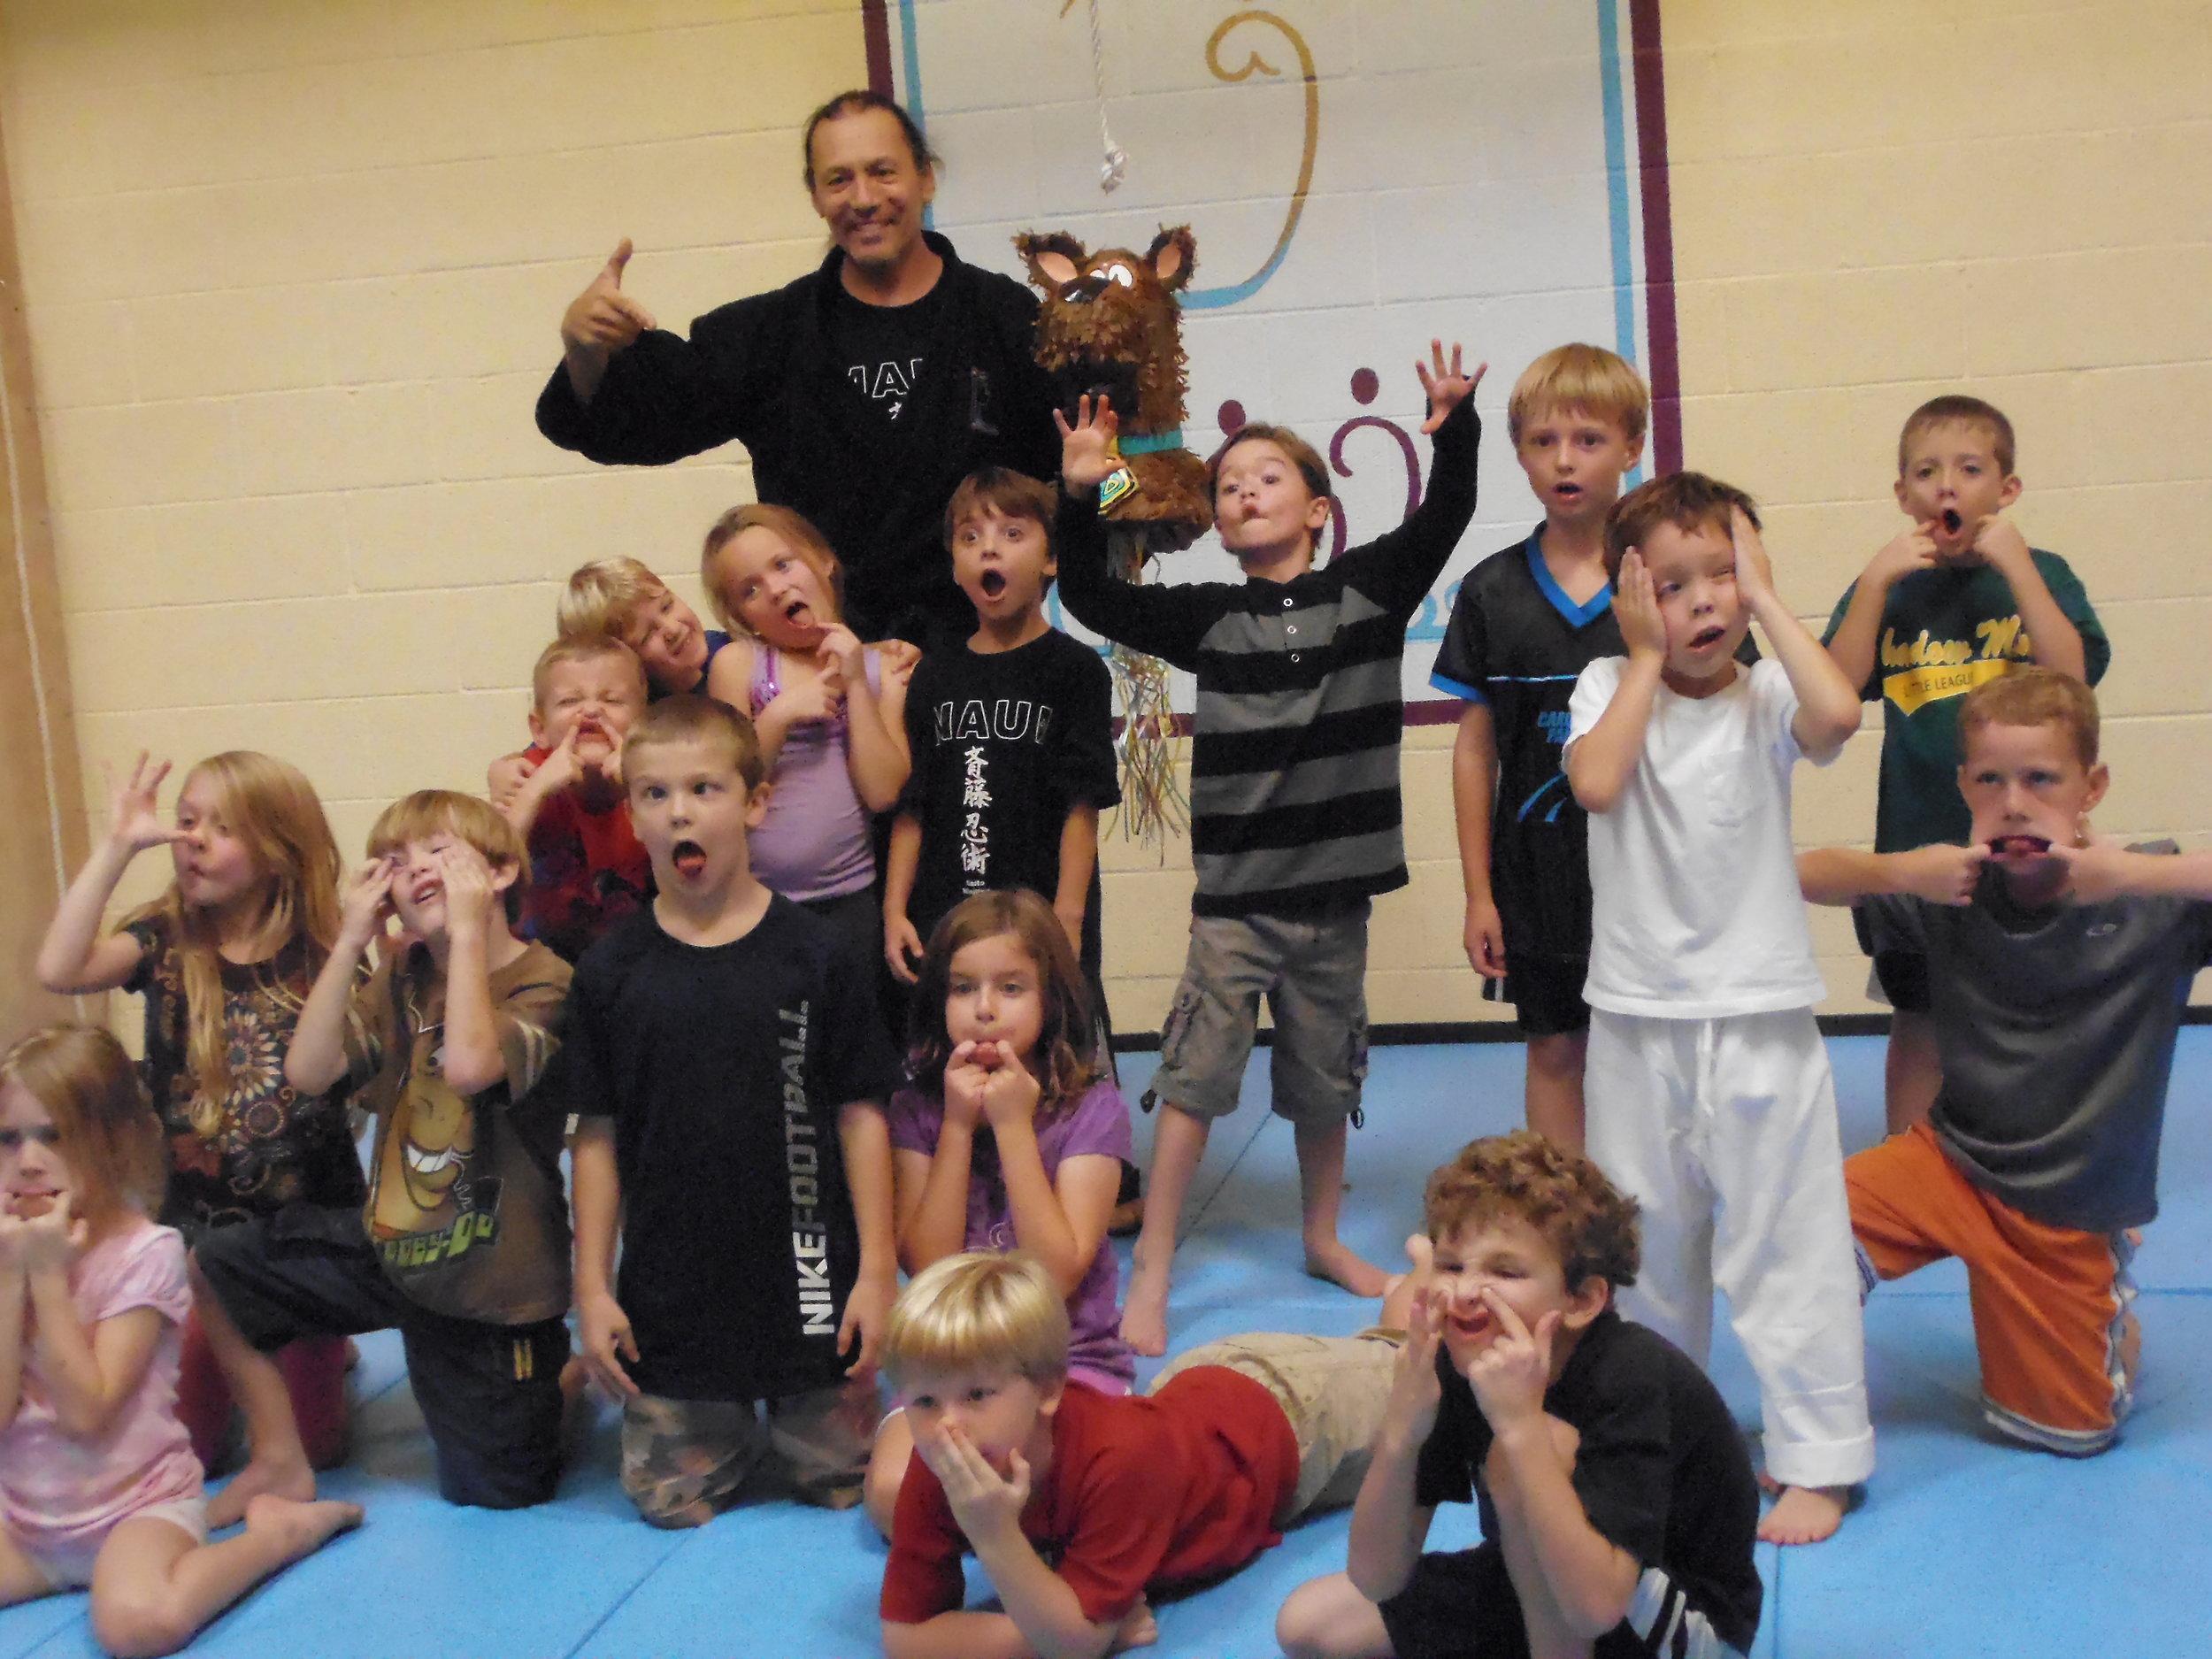 Scottsdale Martial Arts, Free Kids Birthday Party, Karate (7).JPG